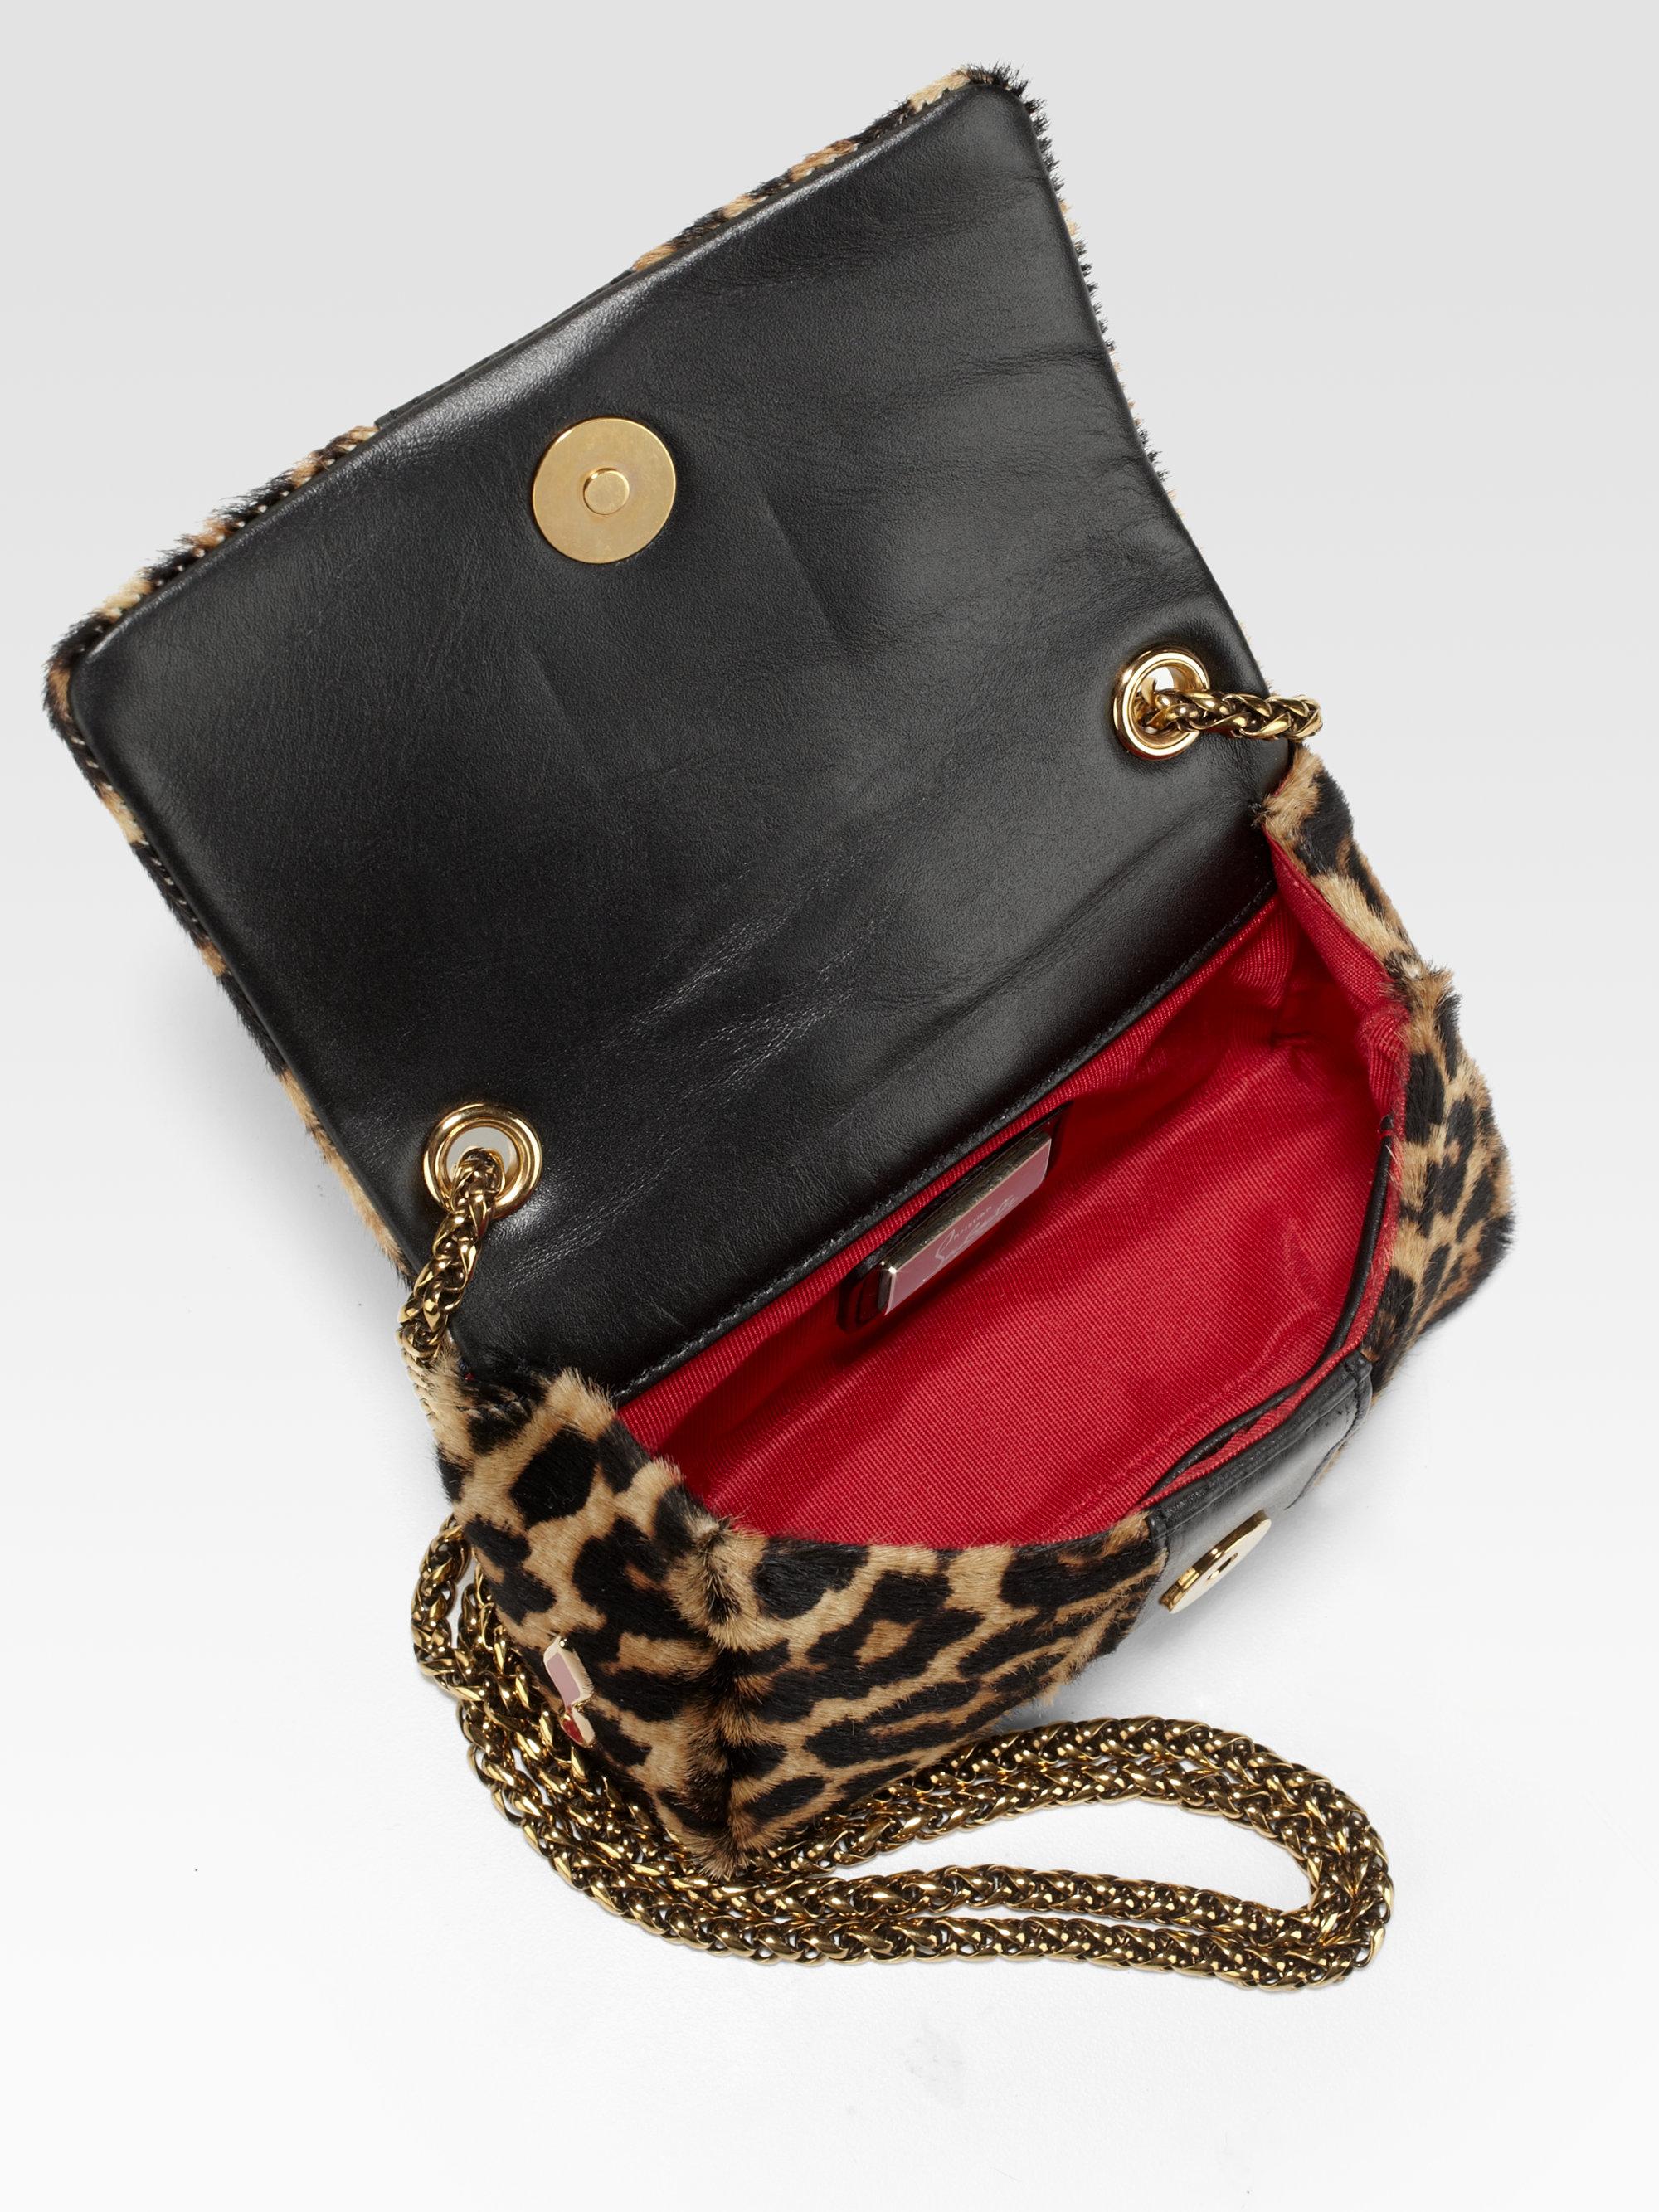 Louis Vuitton Loafers Replica Louboutin Copy